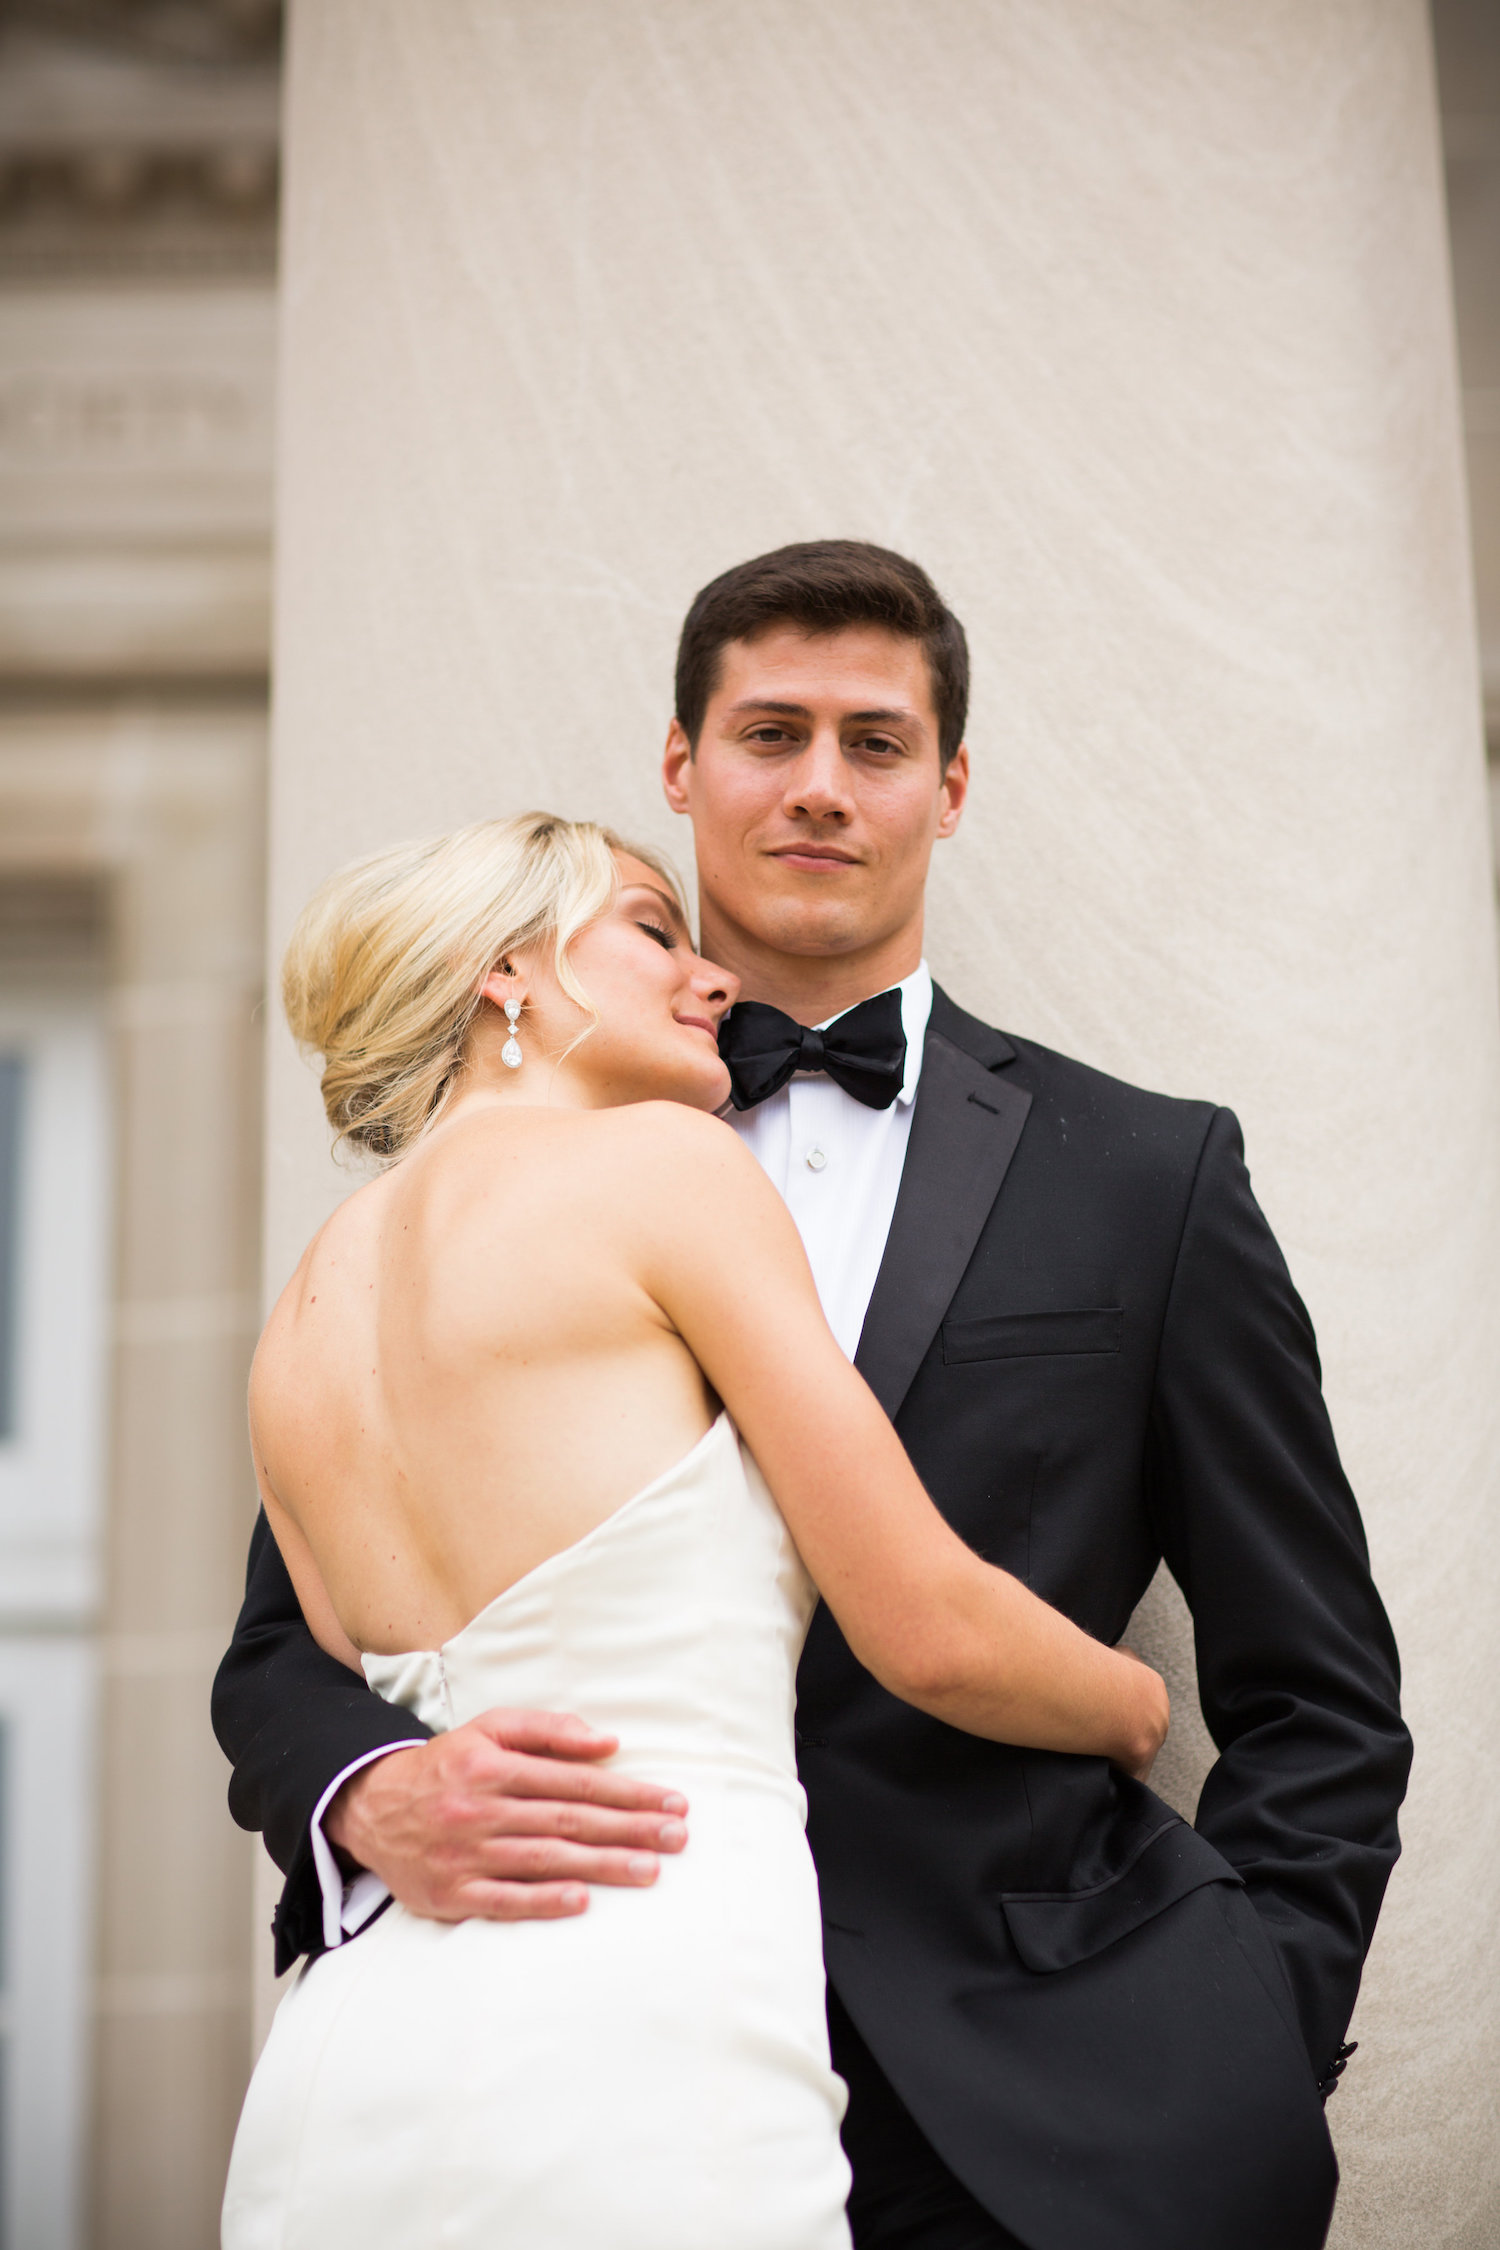 chicago-history-museum-wedding-03.jpg